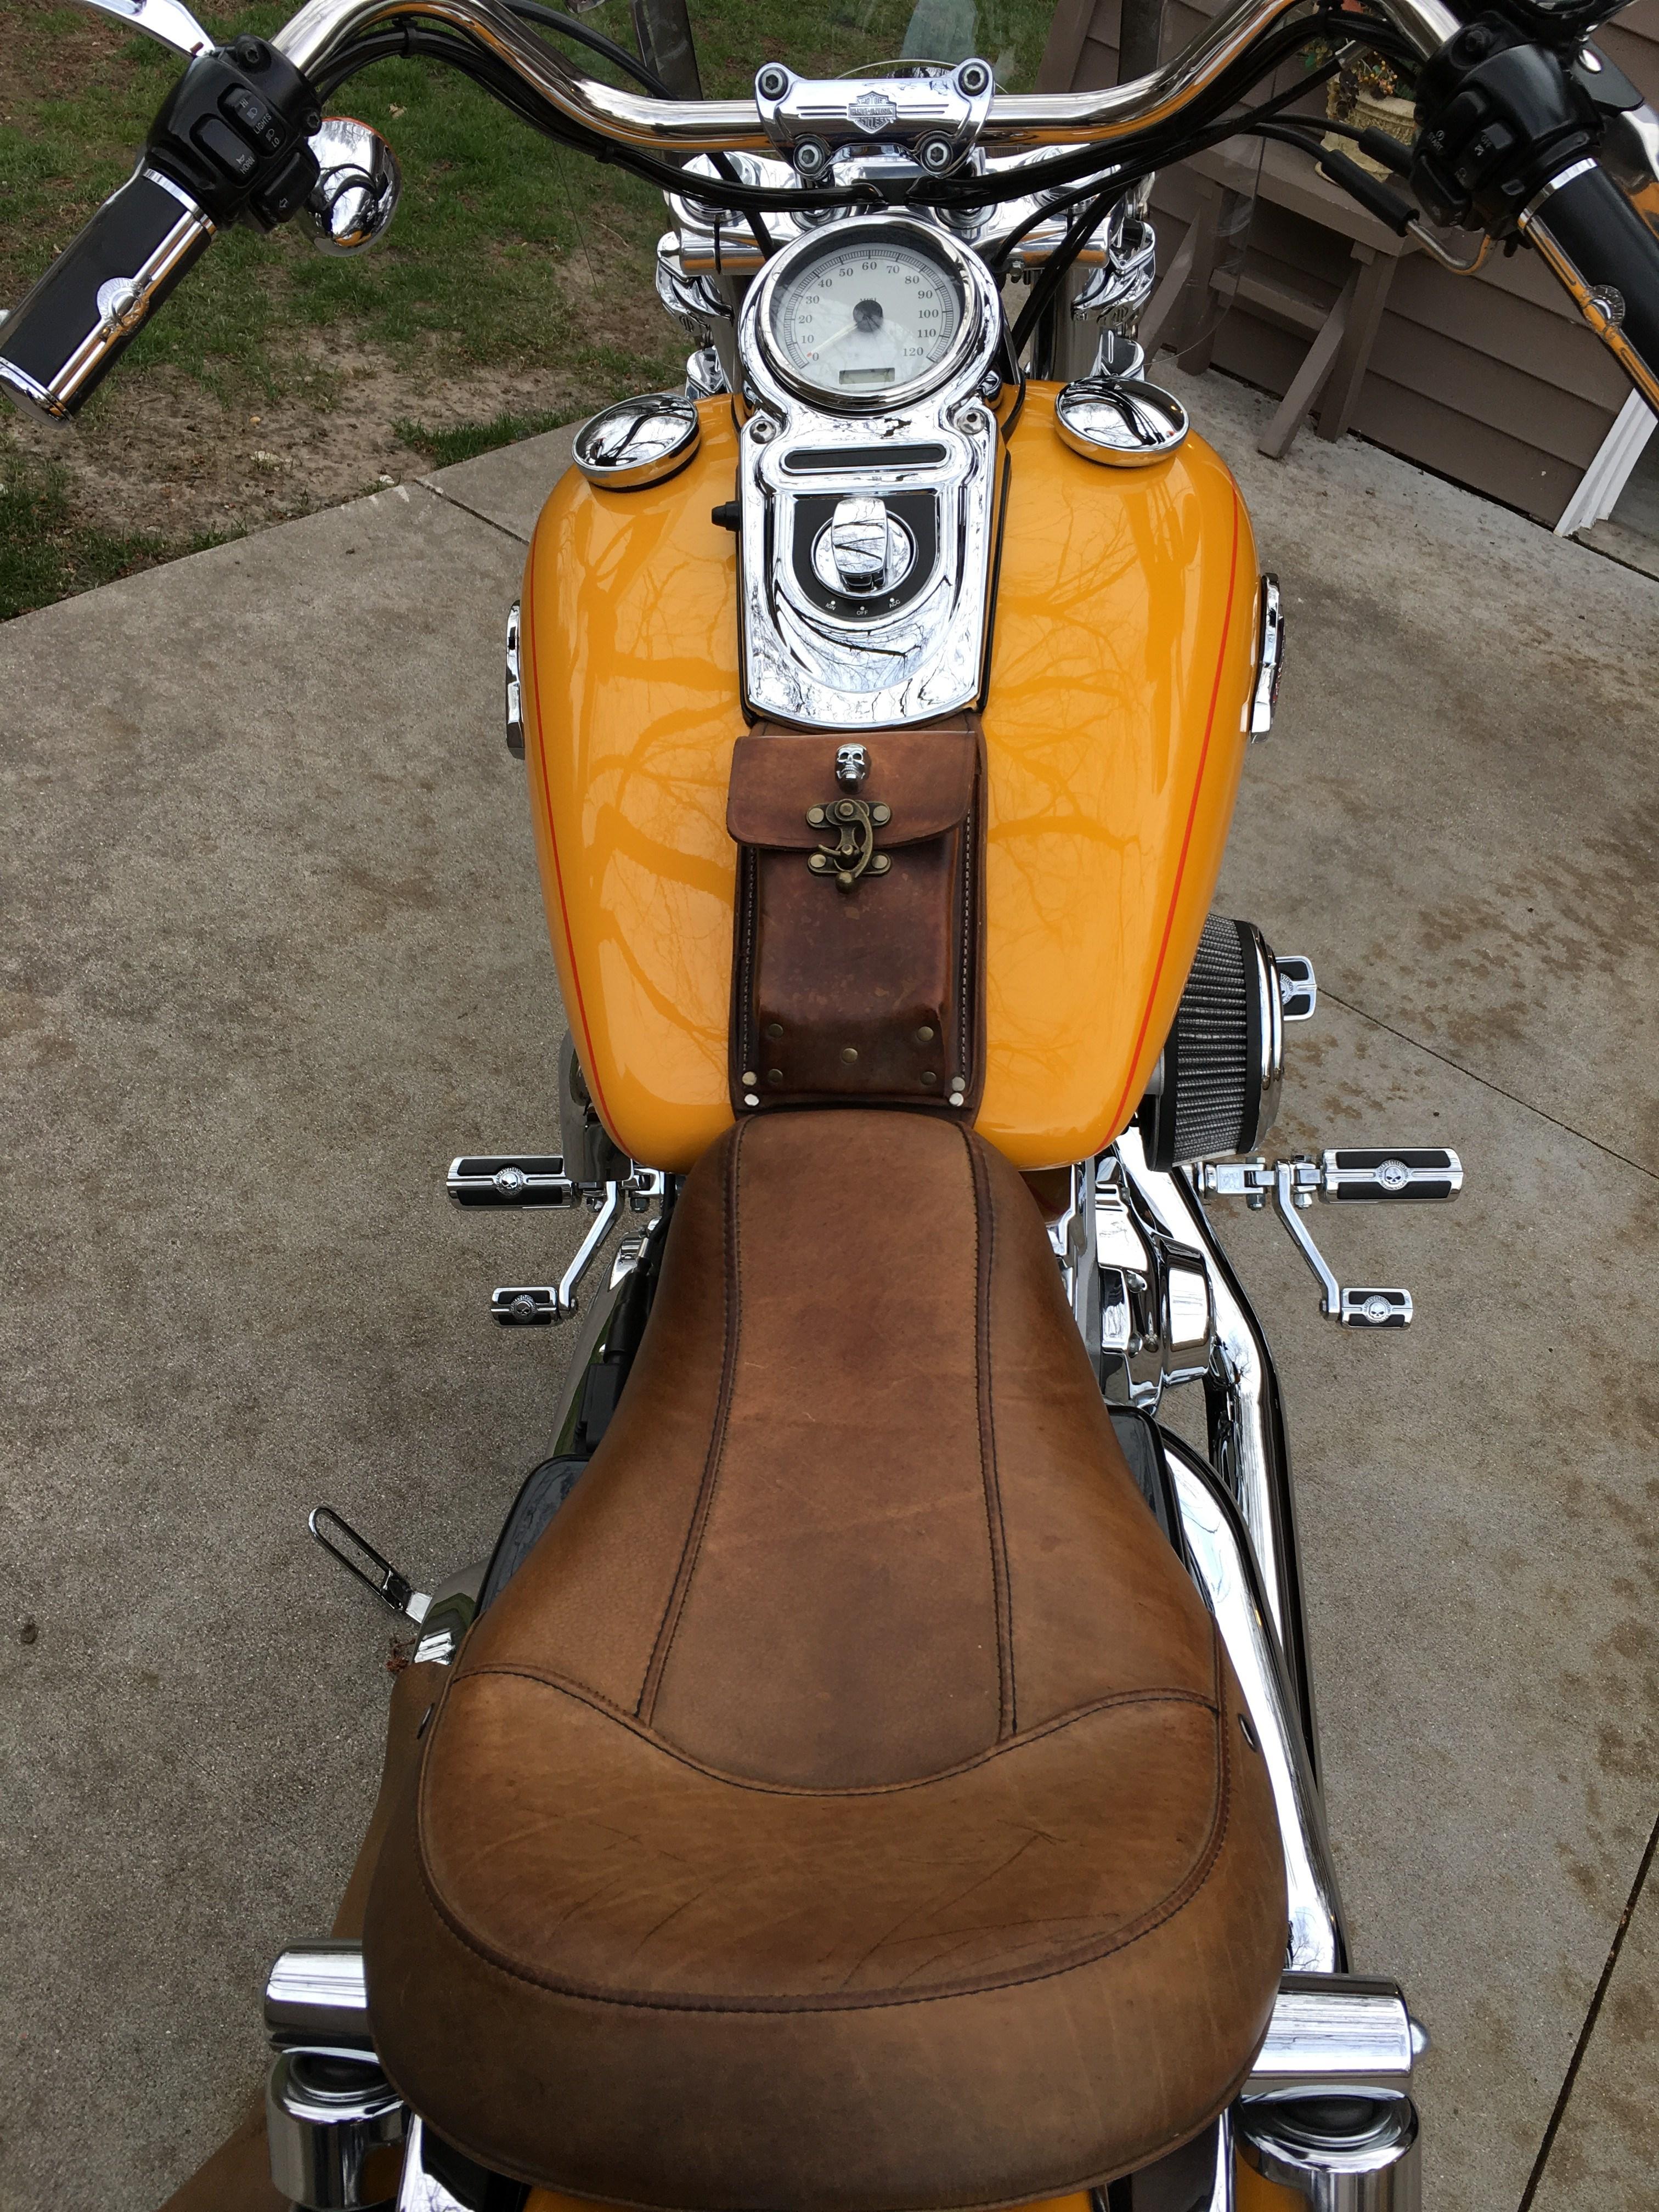 Harley Davidson Covers >> 2008 Harley-Davidson® FXDC Dyna® Super Glide® Custom (Sunset Yellow Pearl), Oak Park, Michigan ...